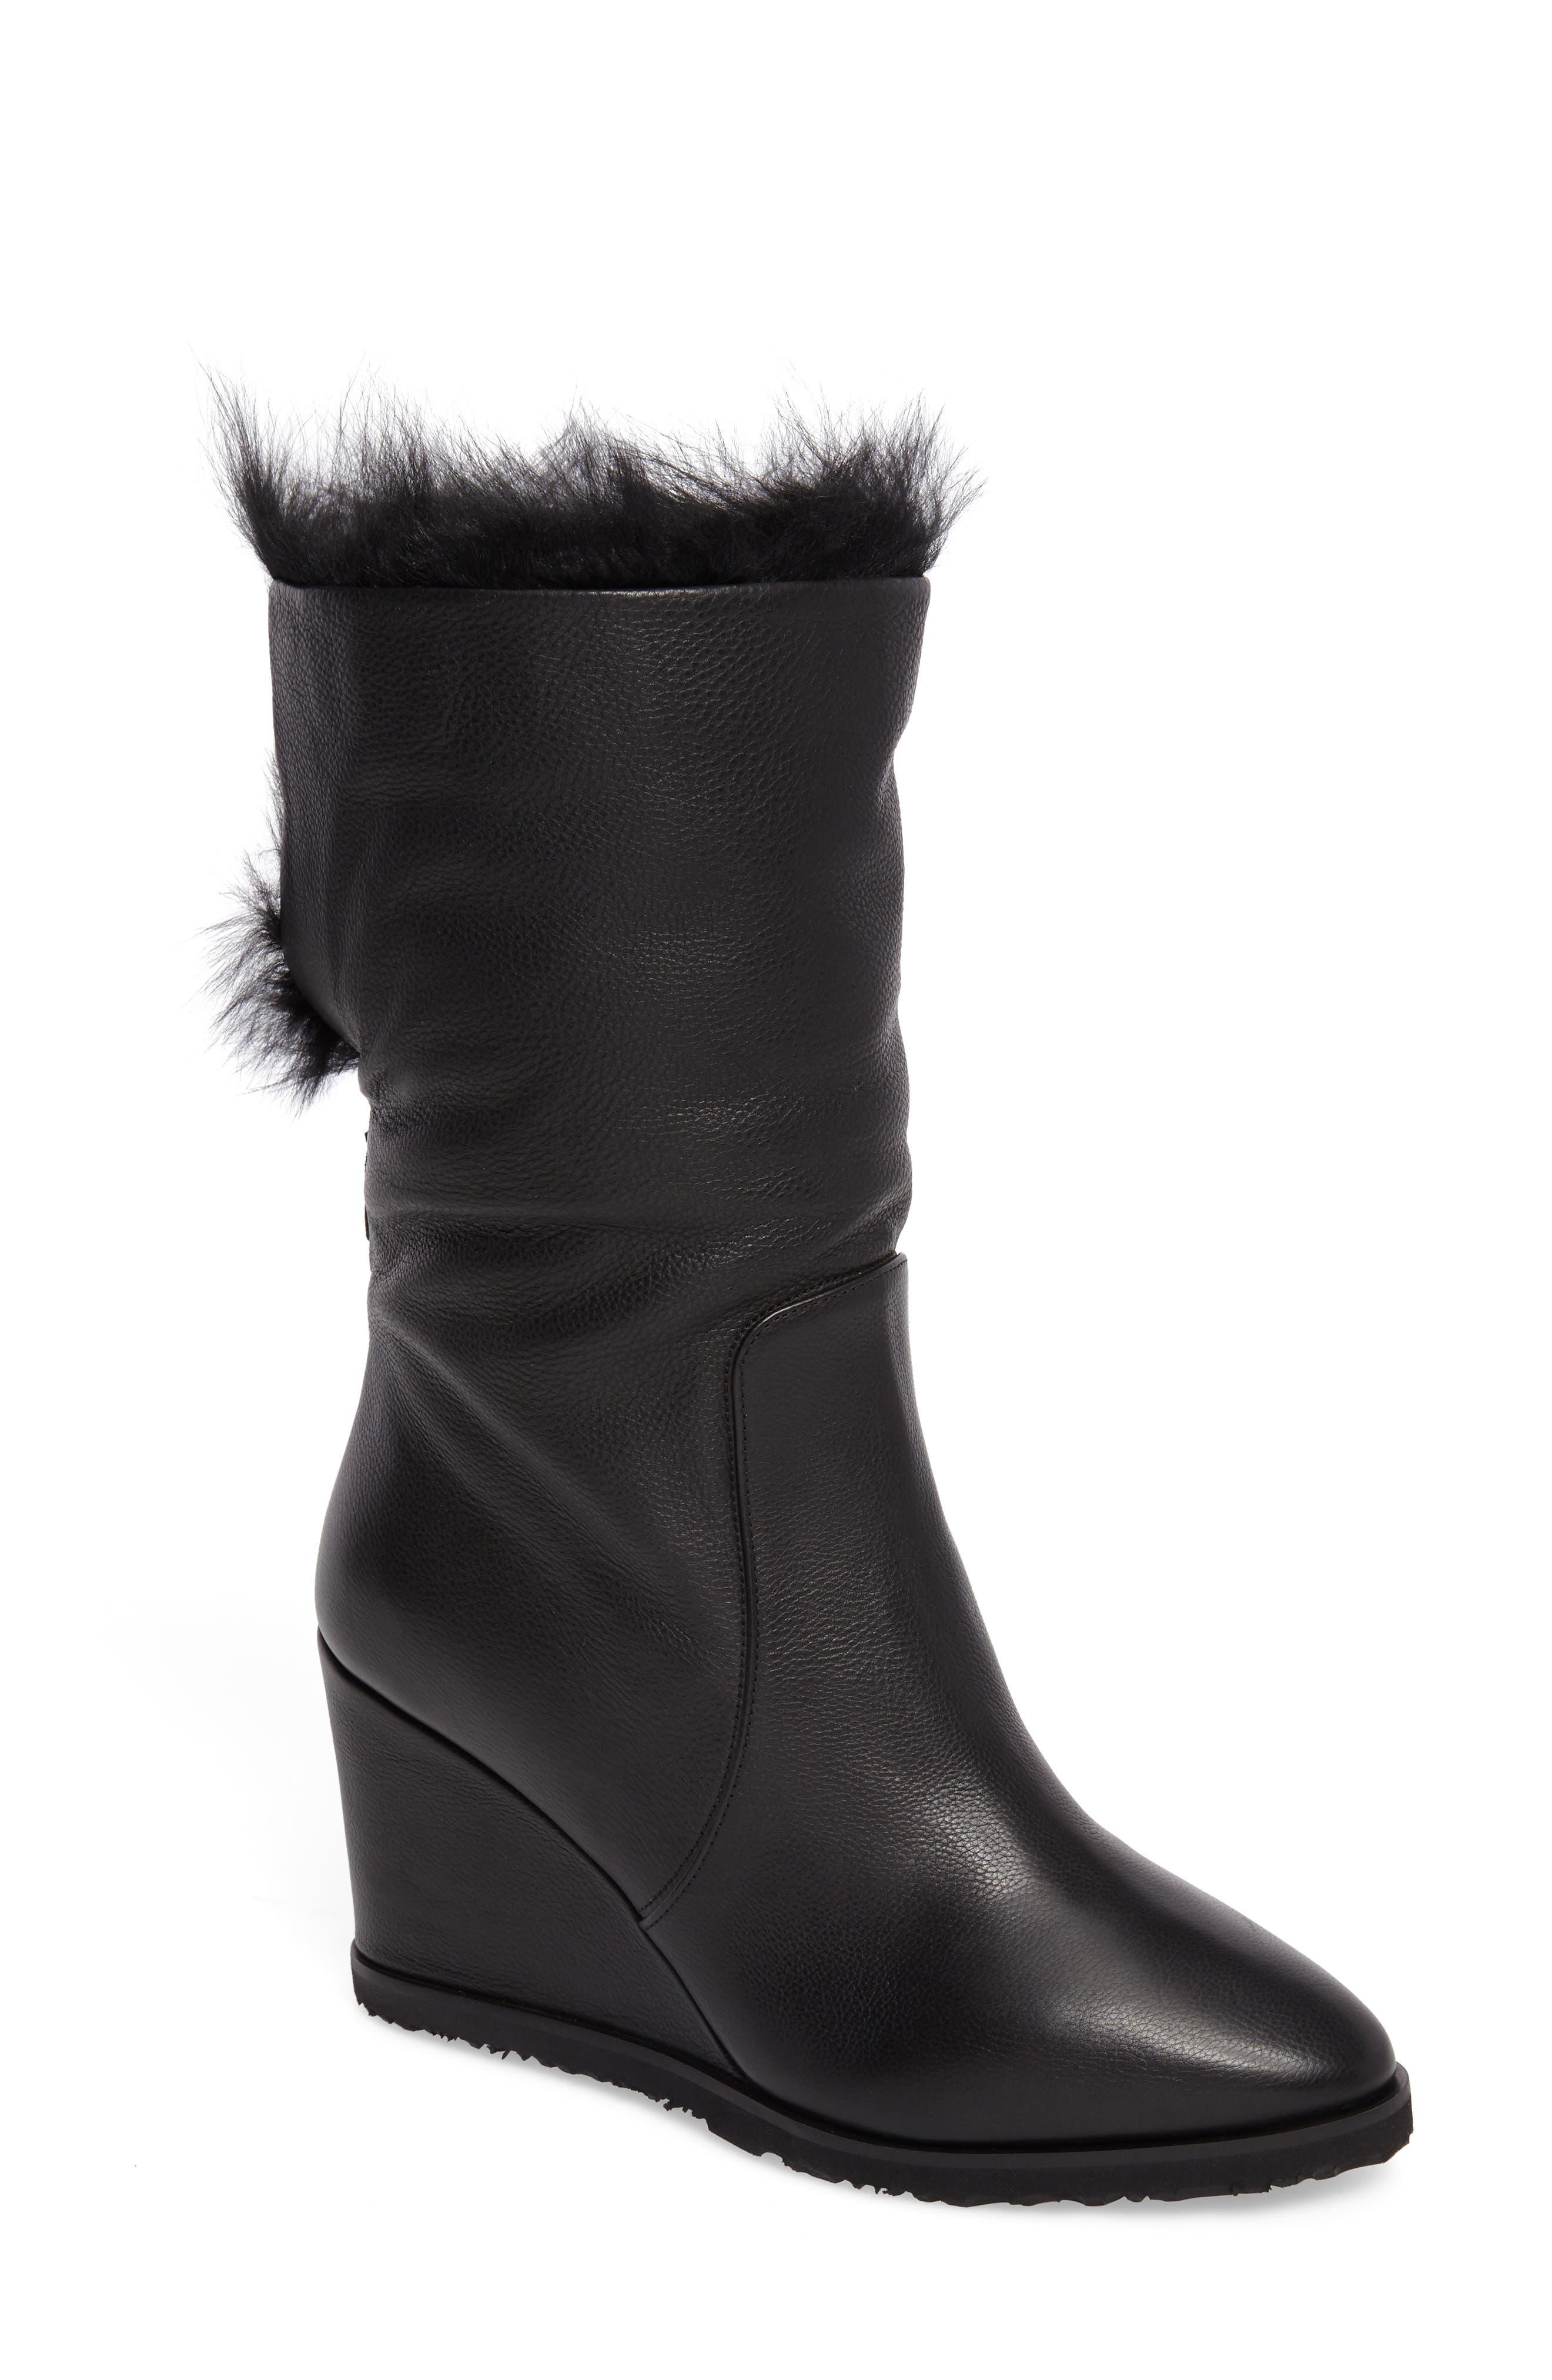 Alternate Image 1 Selected - Taryn Rose Massima Genuine Shearling Wedge Boot (Women)